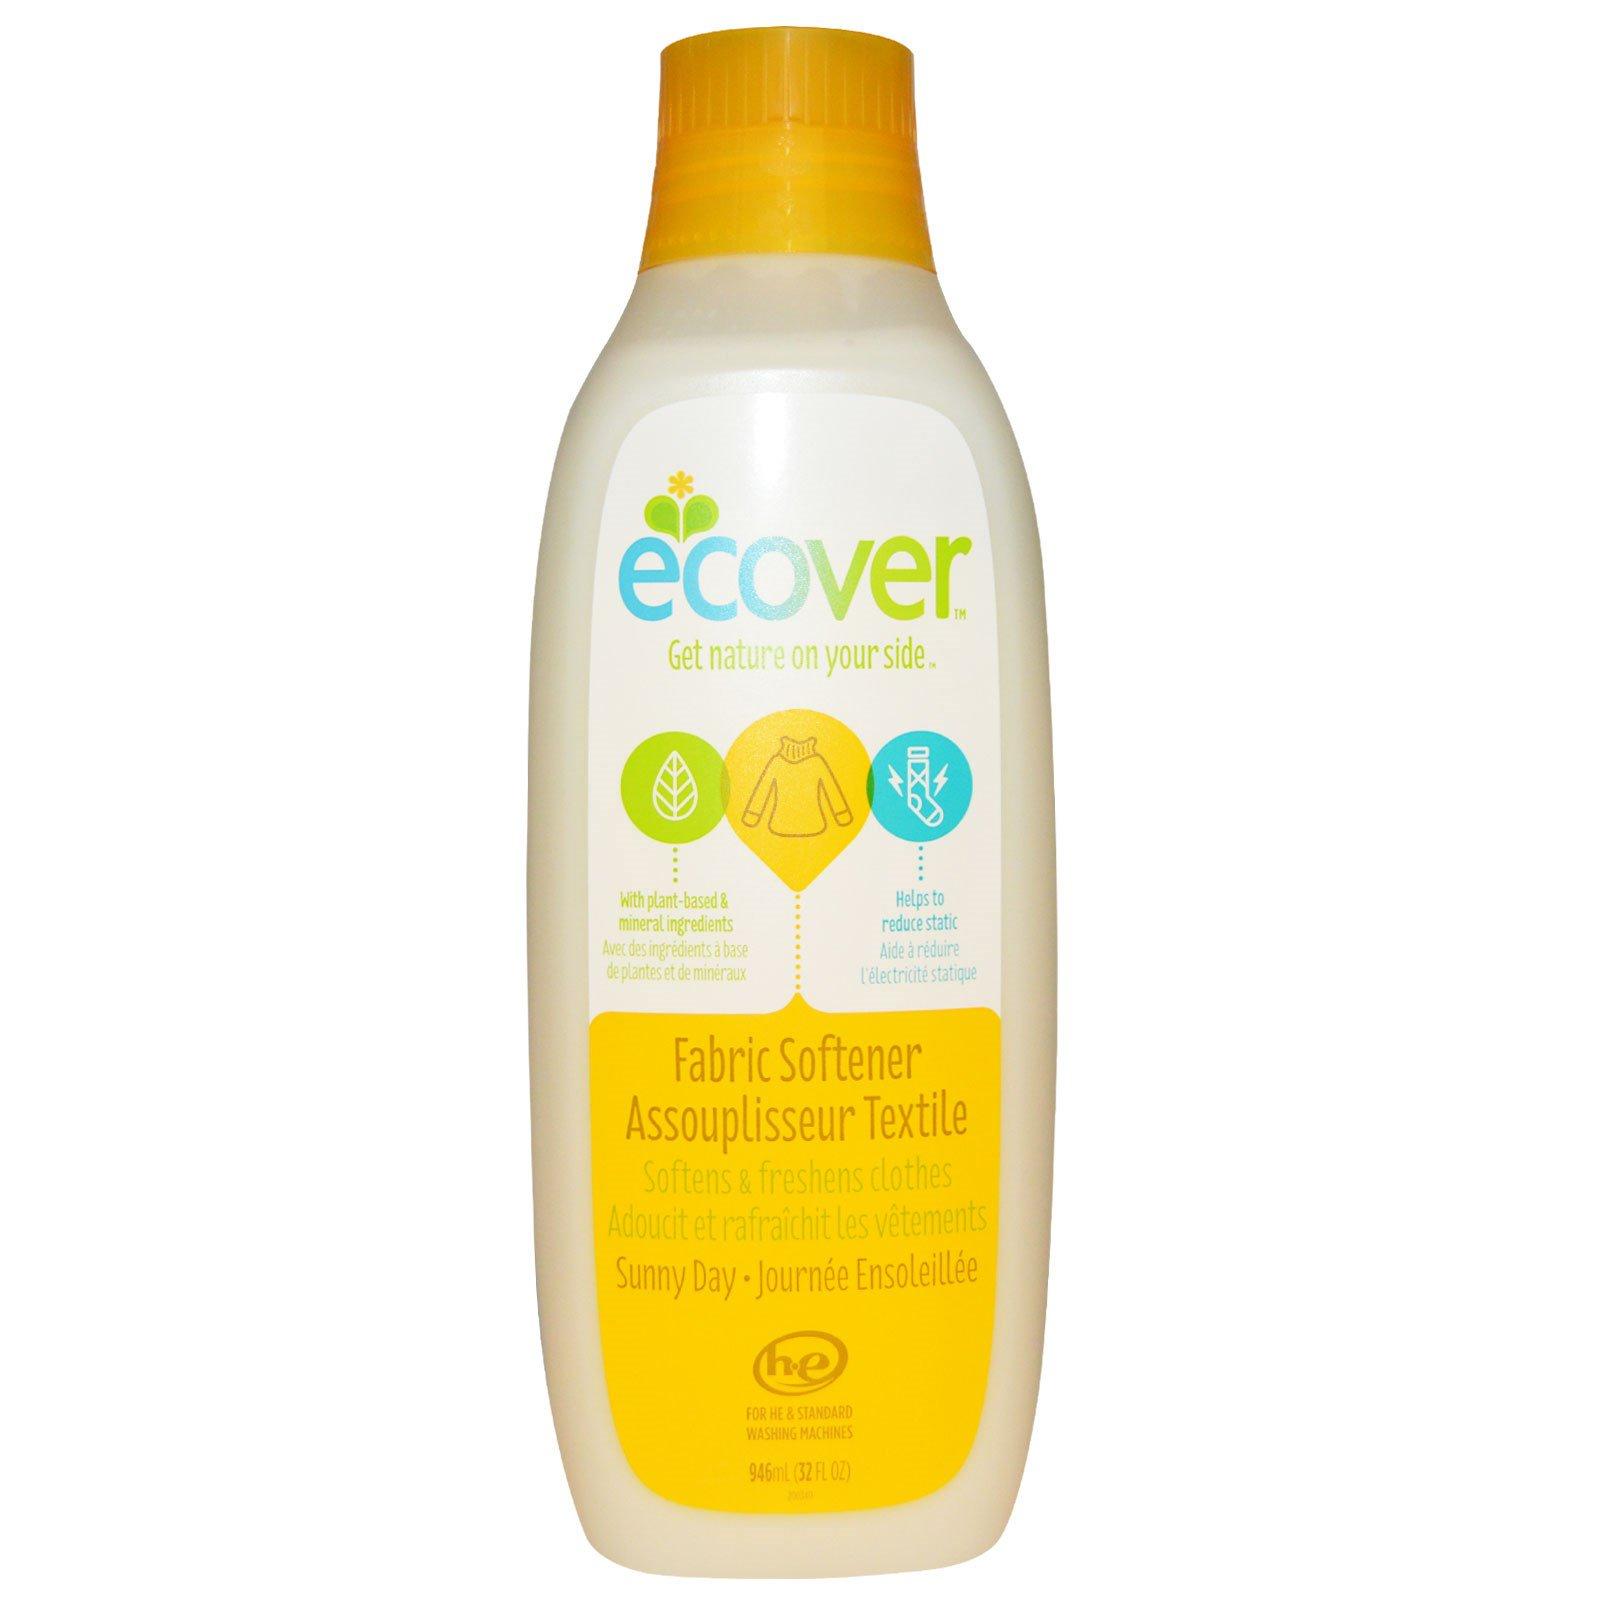 Ecover Fabric Softener Sunny Day 32 fl oz 946 ml iHerb